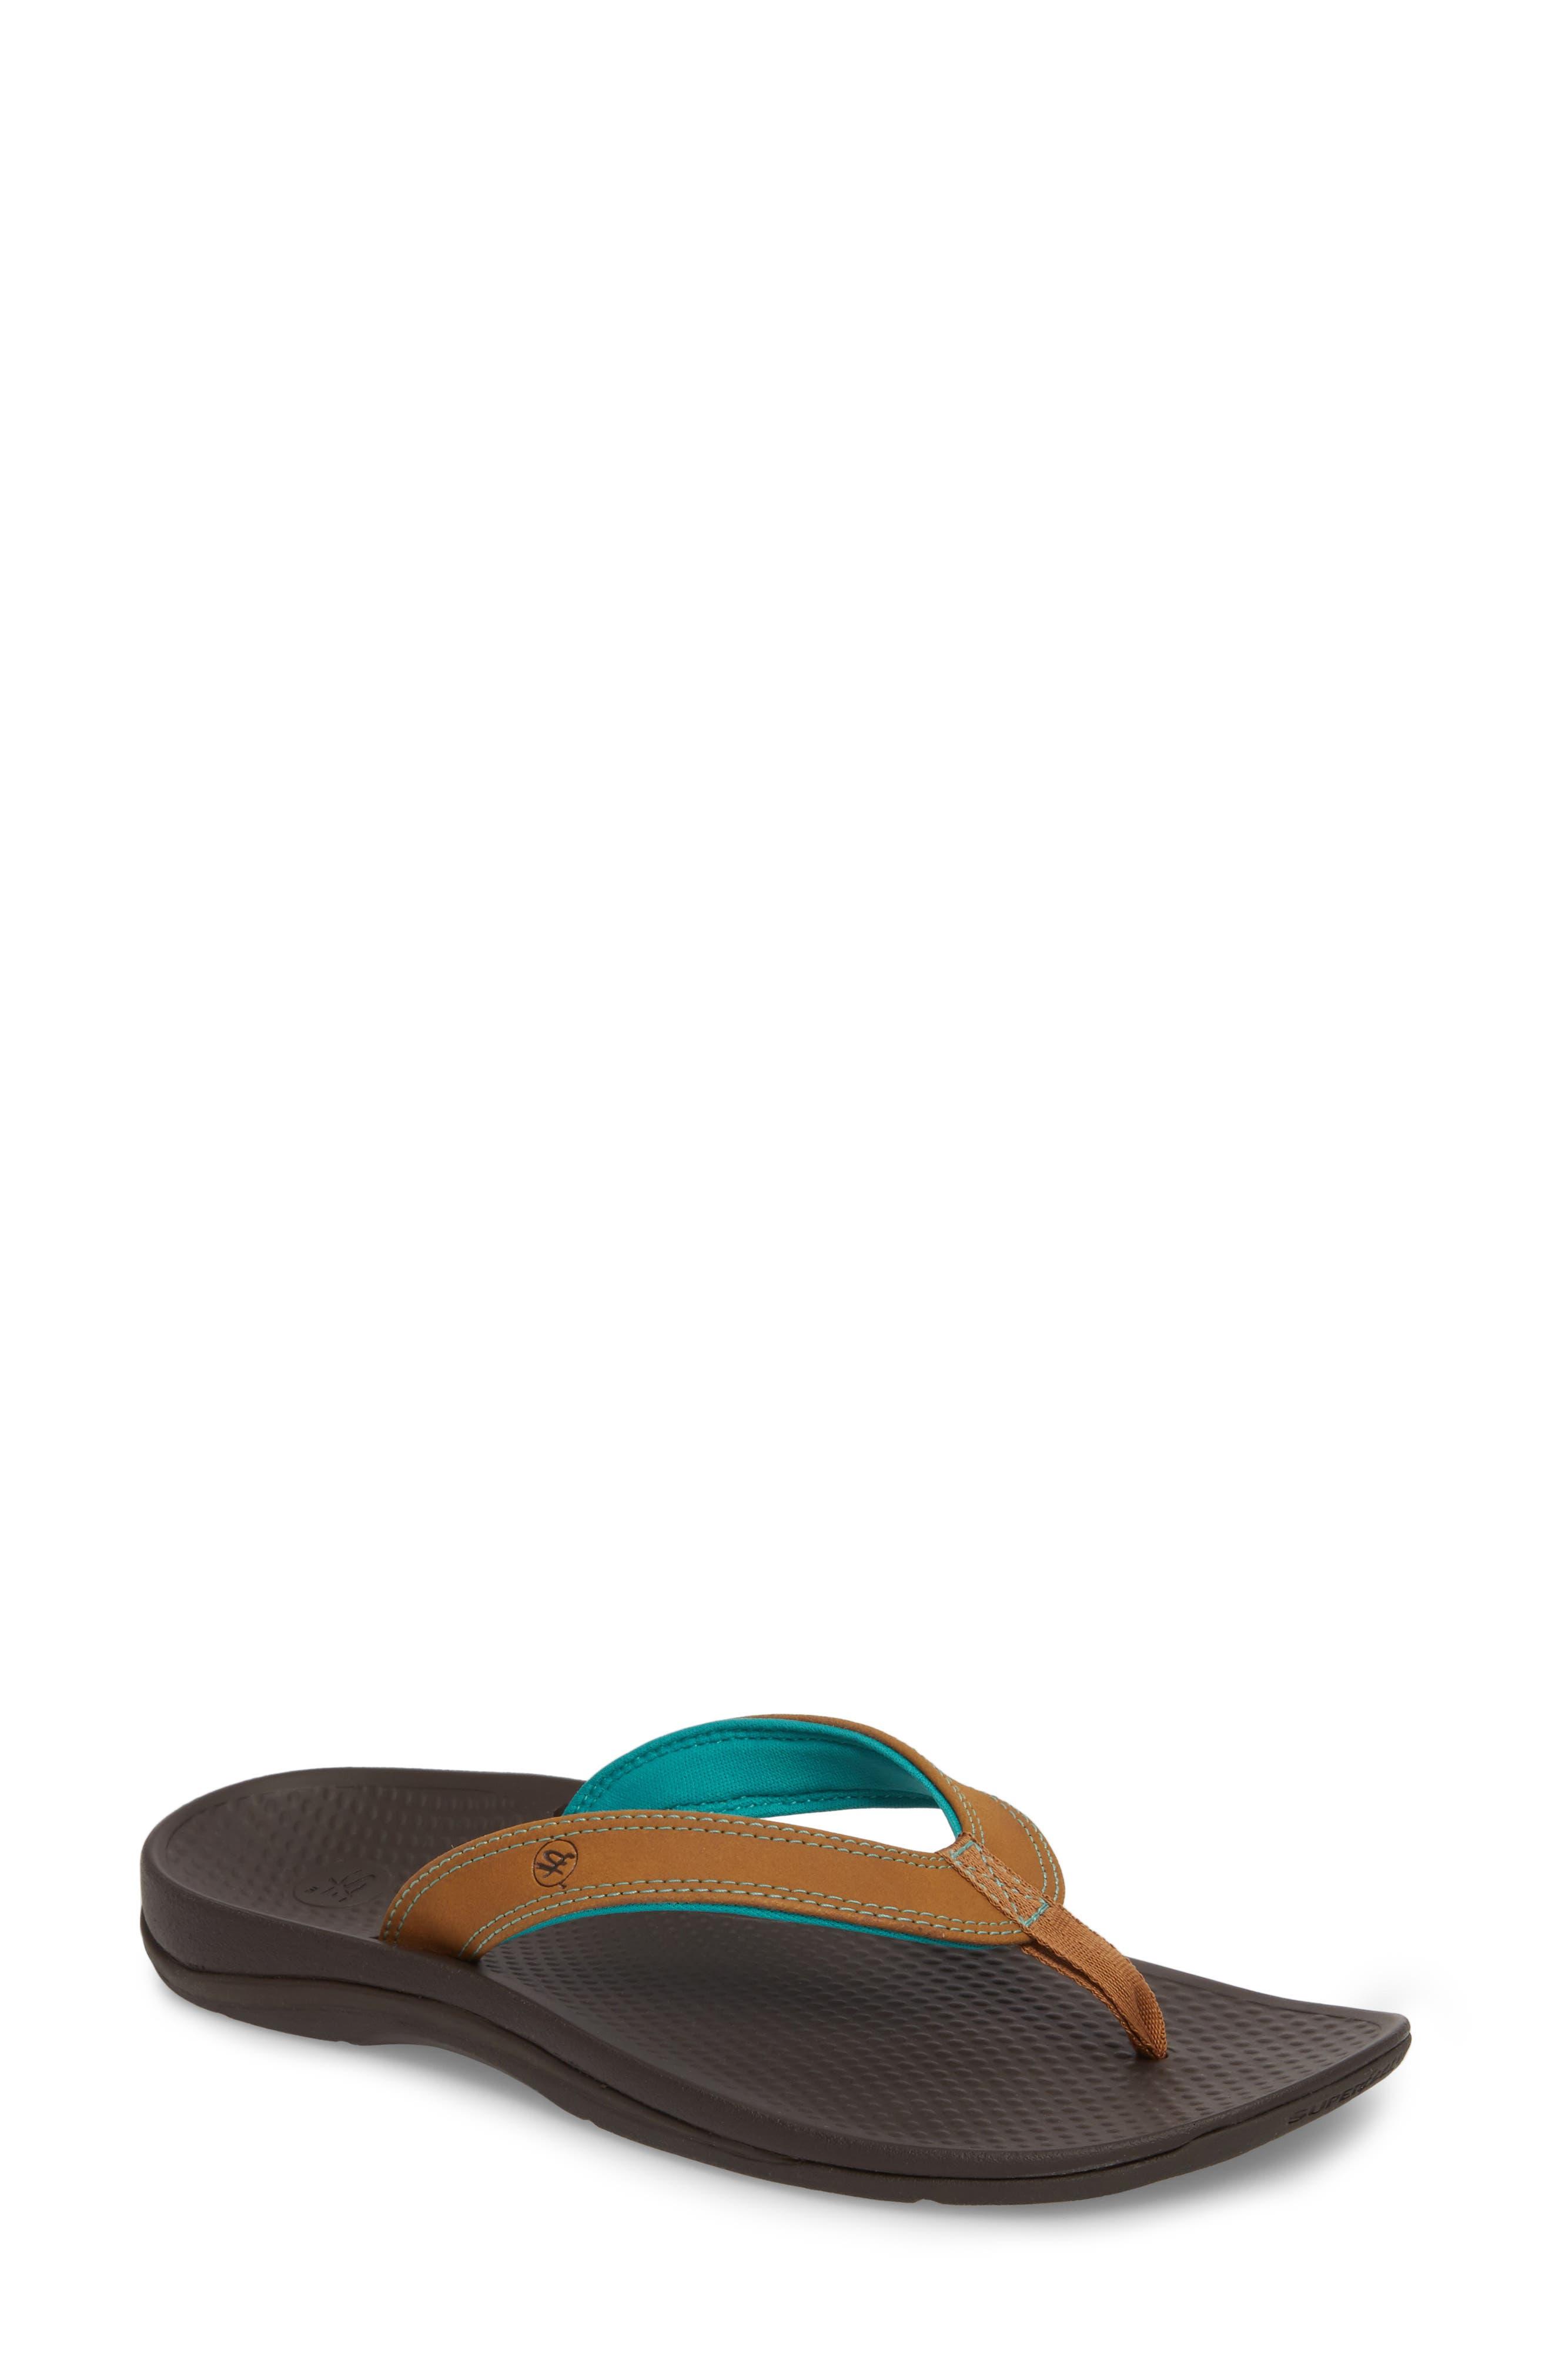 Outside 2.0 Flip Flop,                         Main,                         color, BROWN FAUX LEATHER